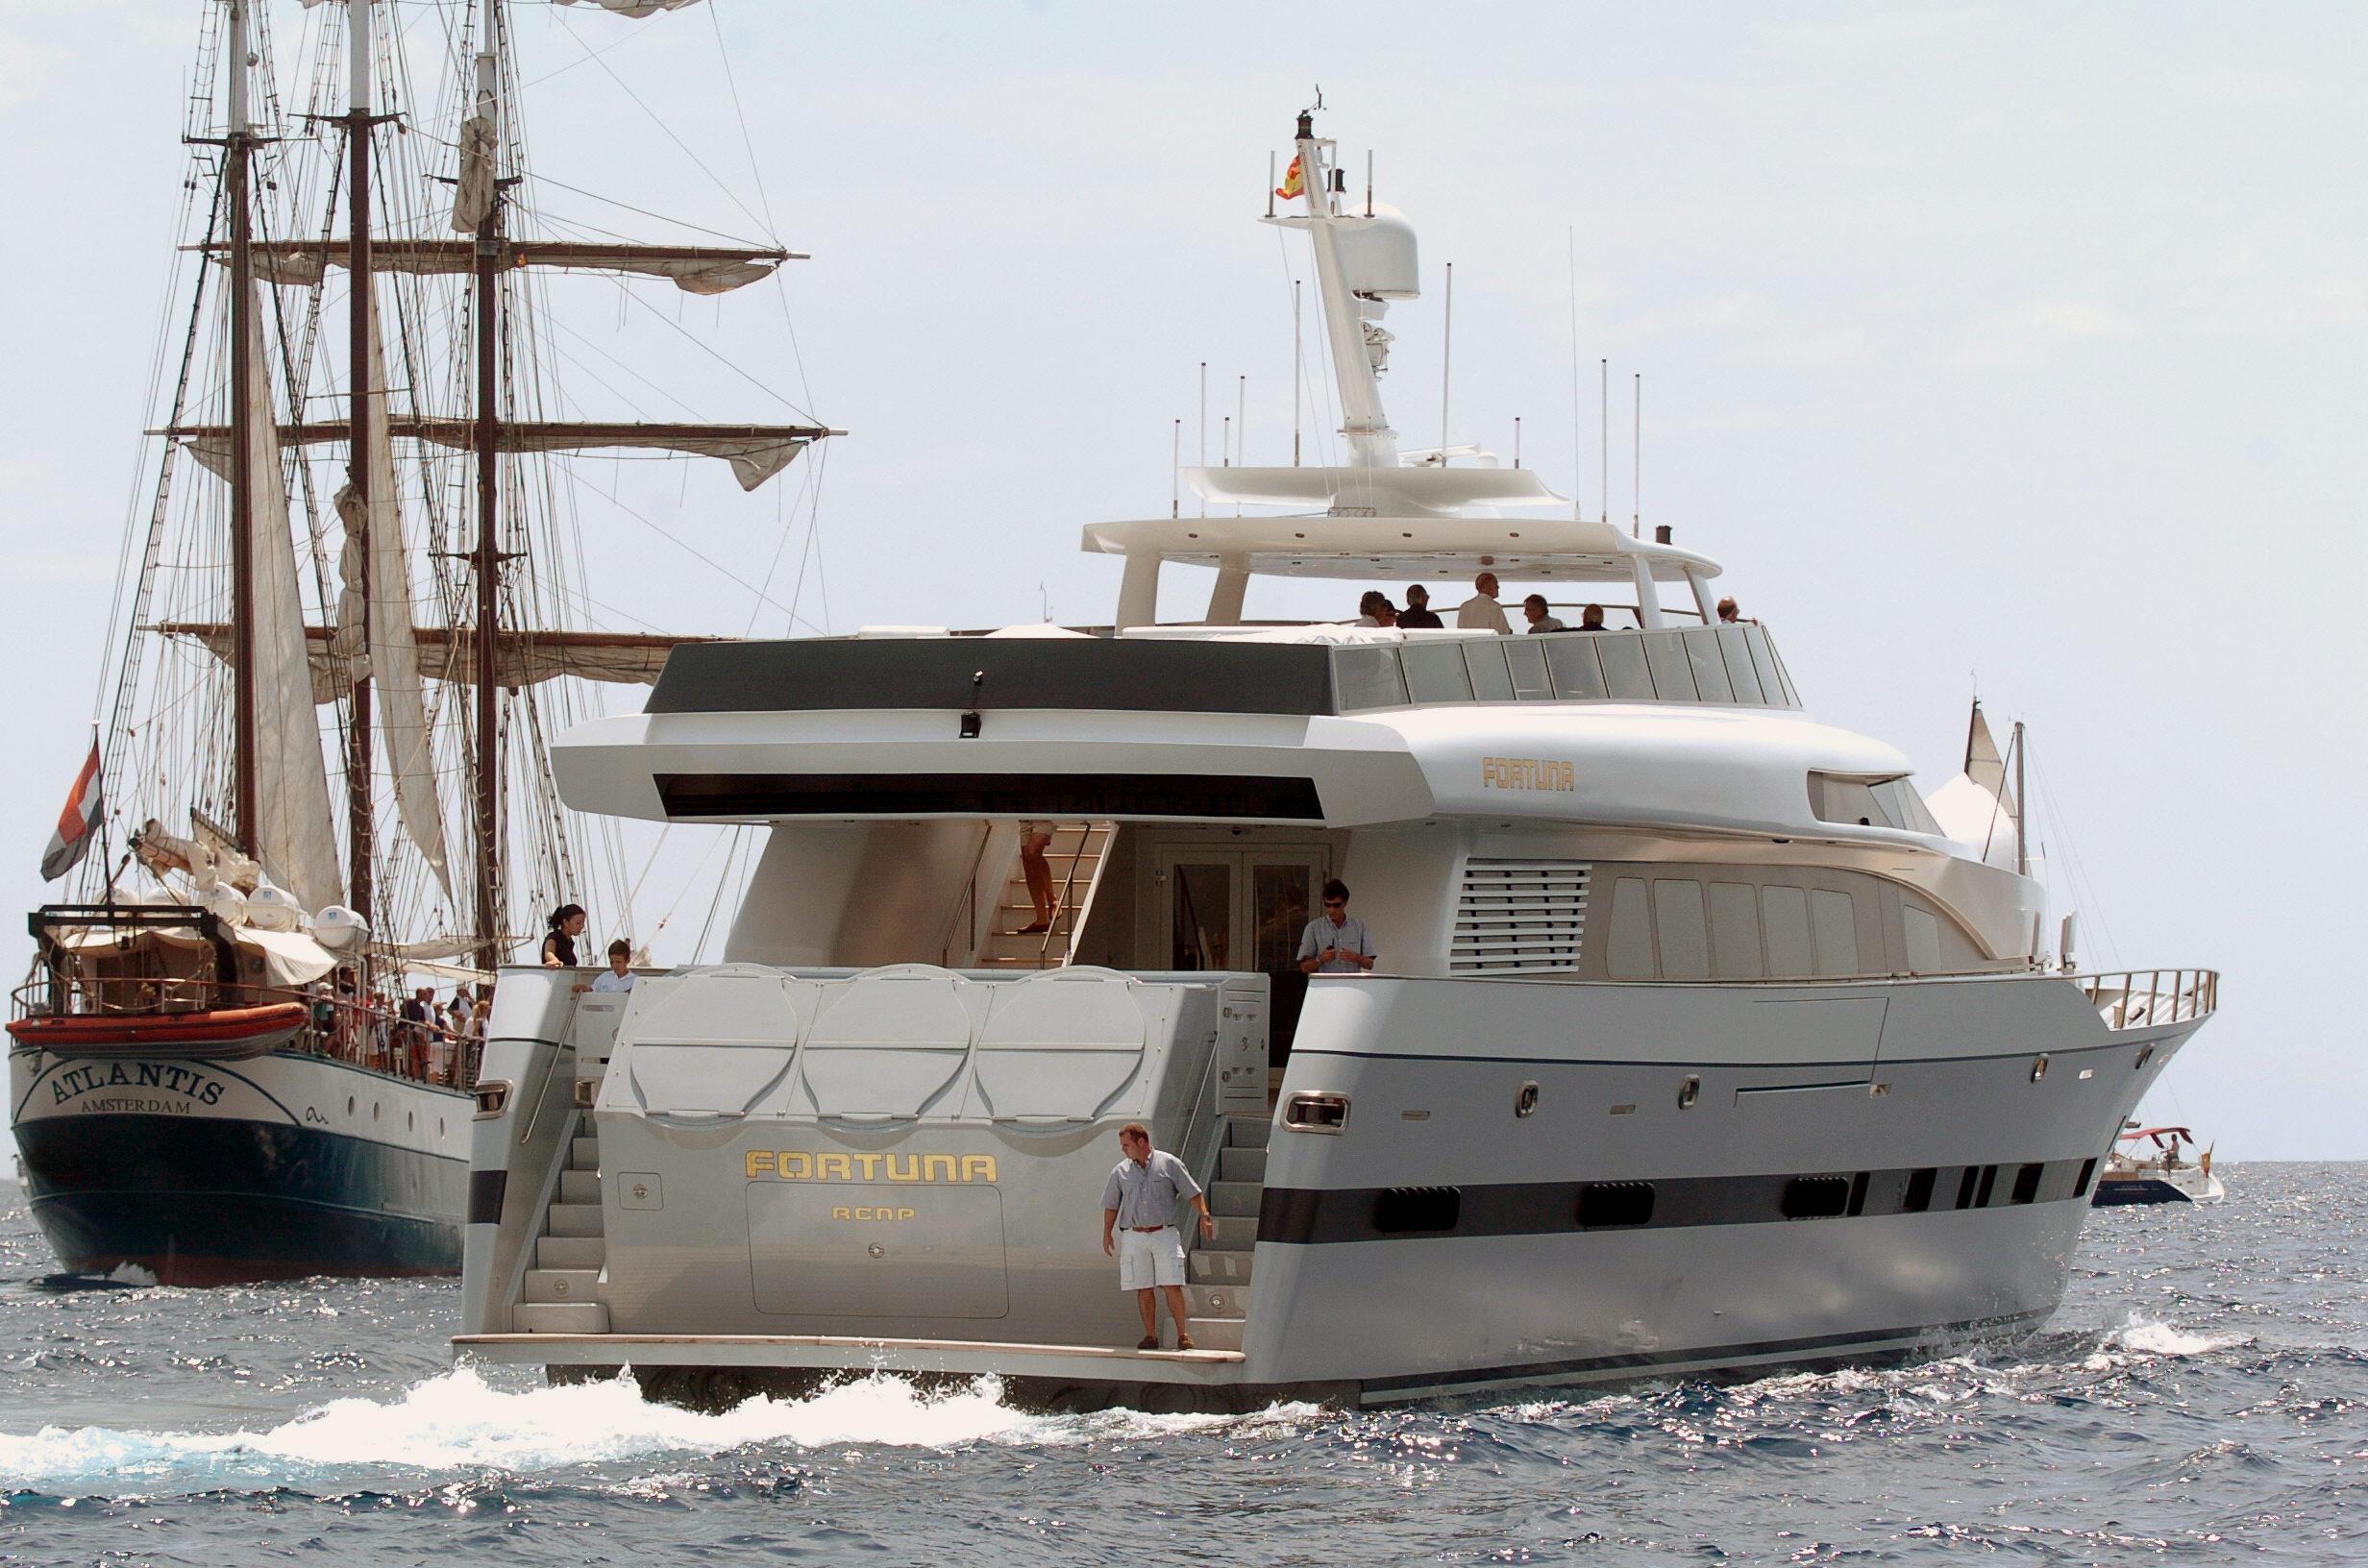 Los diez tripulantes del »Fortuna» cobrarán 1,23 millones de euros